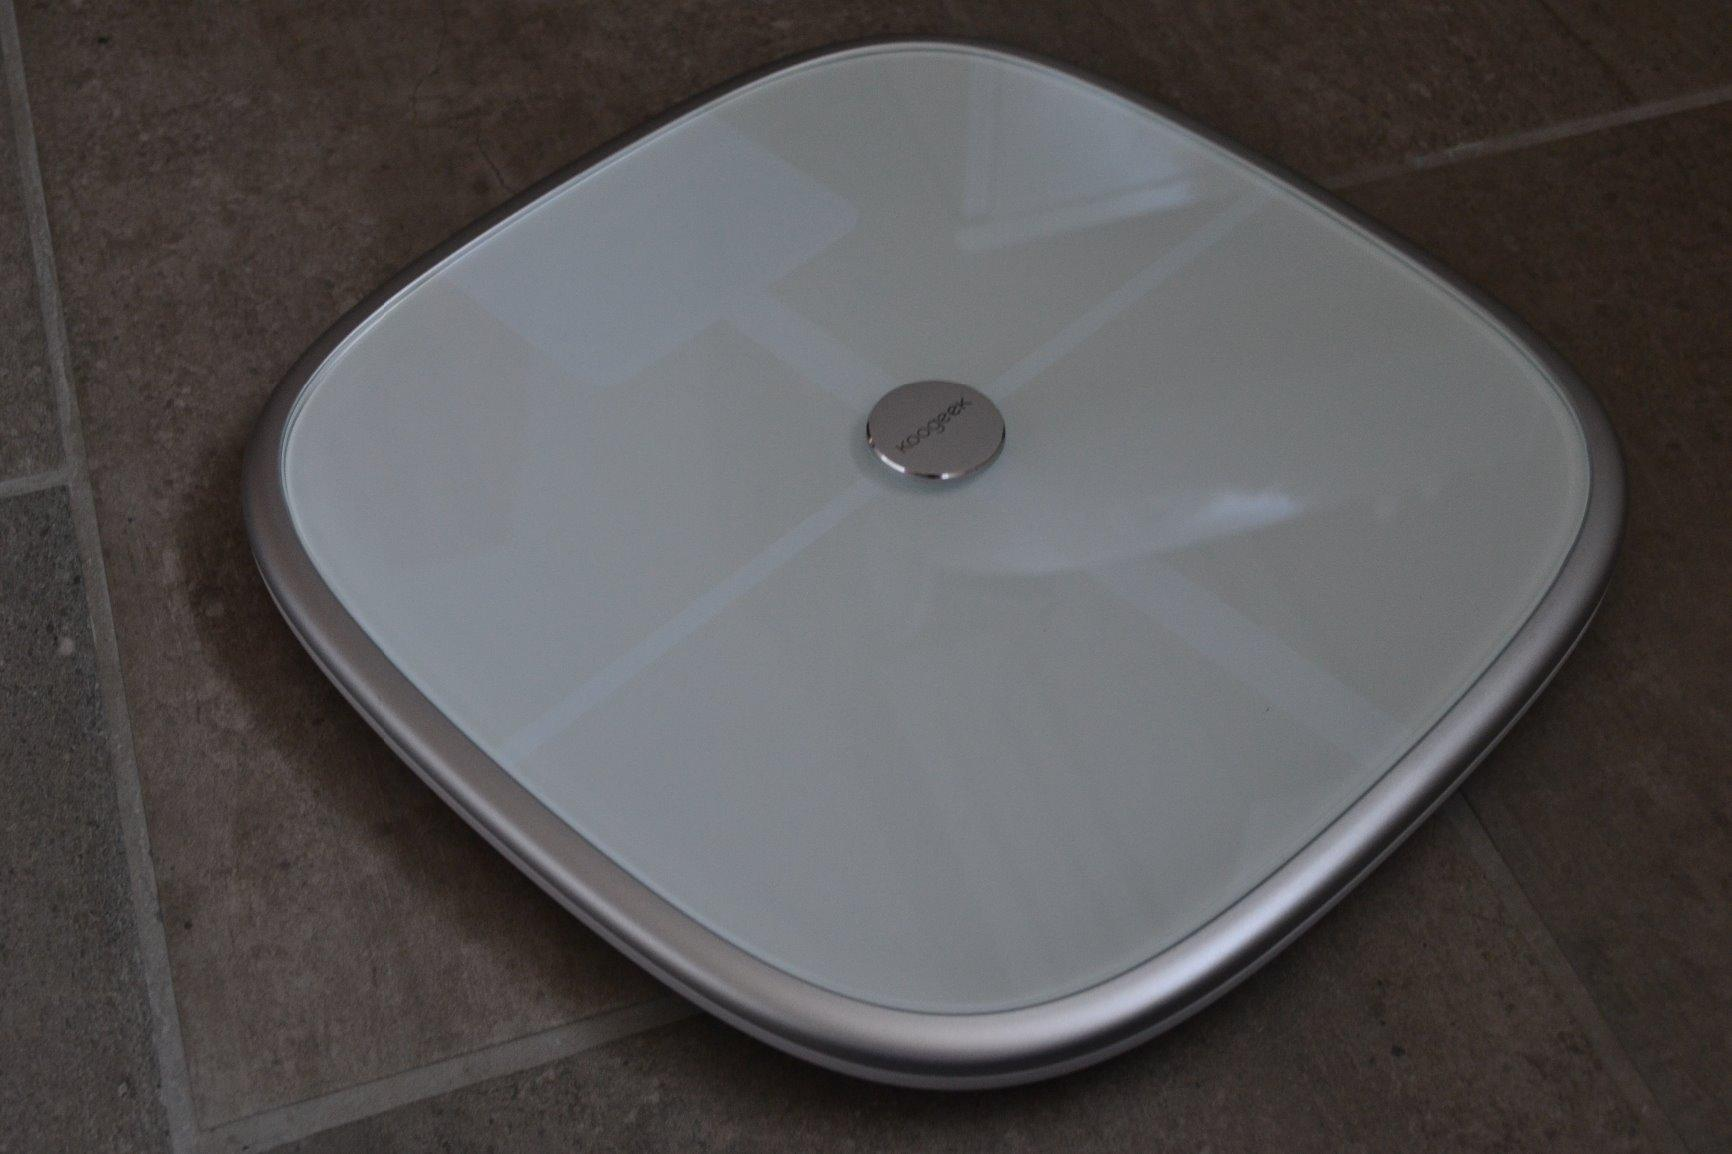 Koogeek Smart Health Scale Bluetooth Wifi Sync Measures